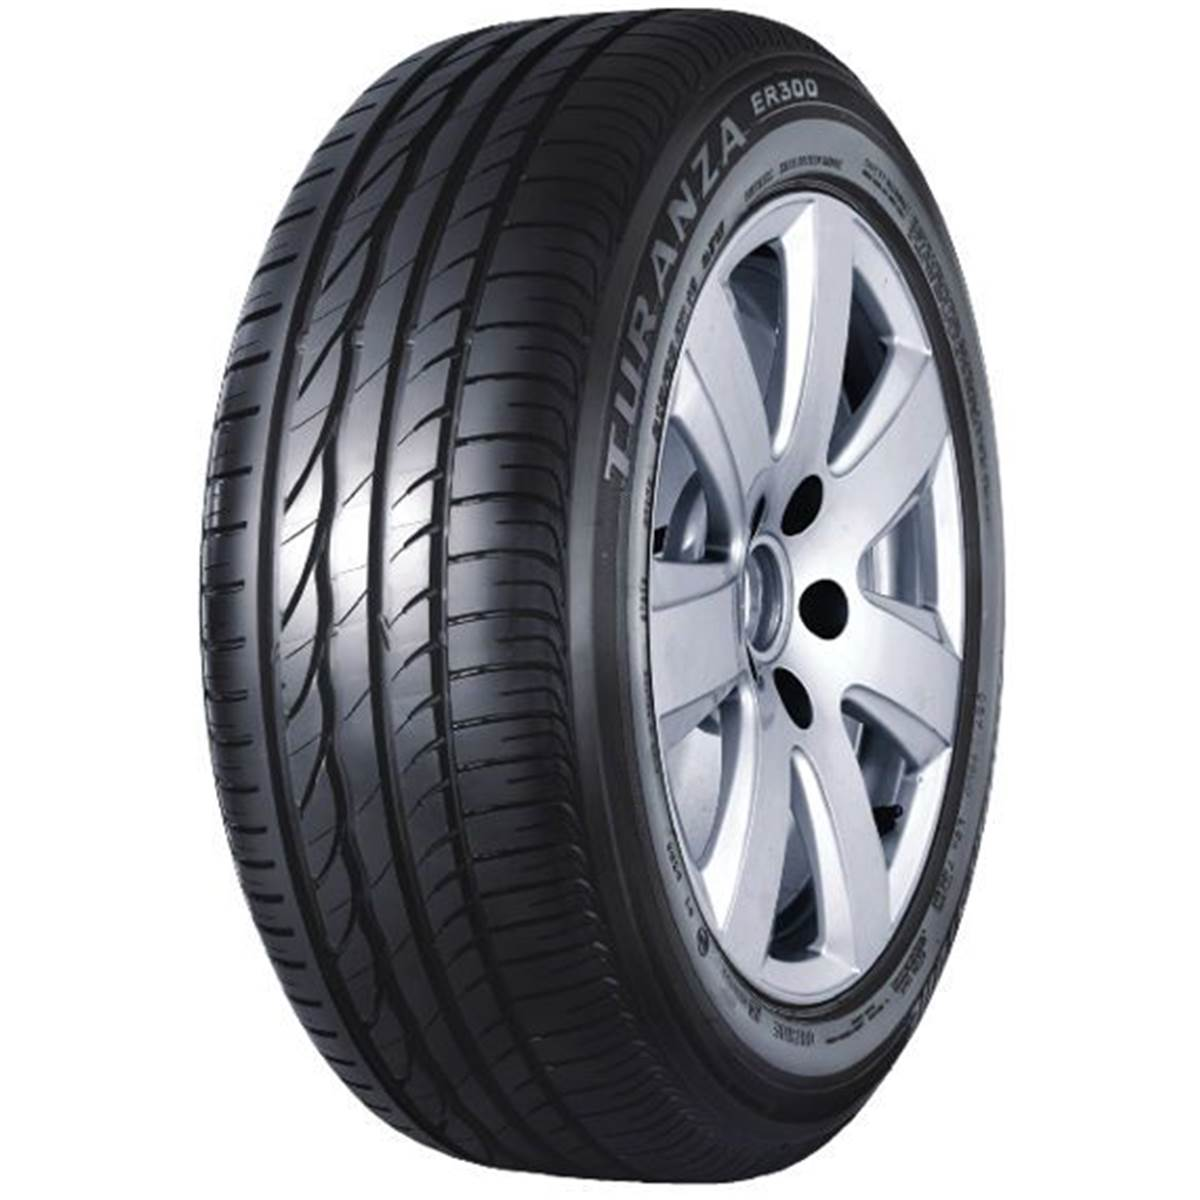 Pneu Bridgestone 215/50R17 95W Turanza Er300 XL